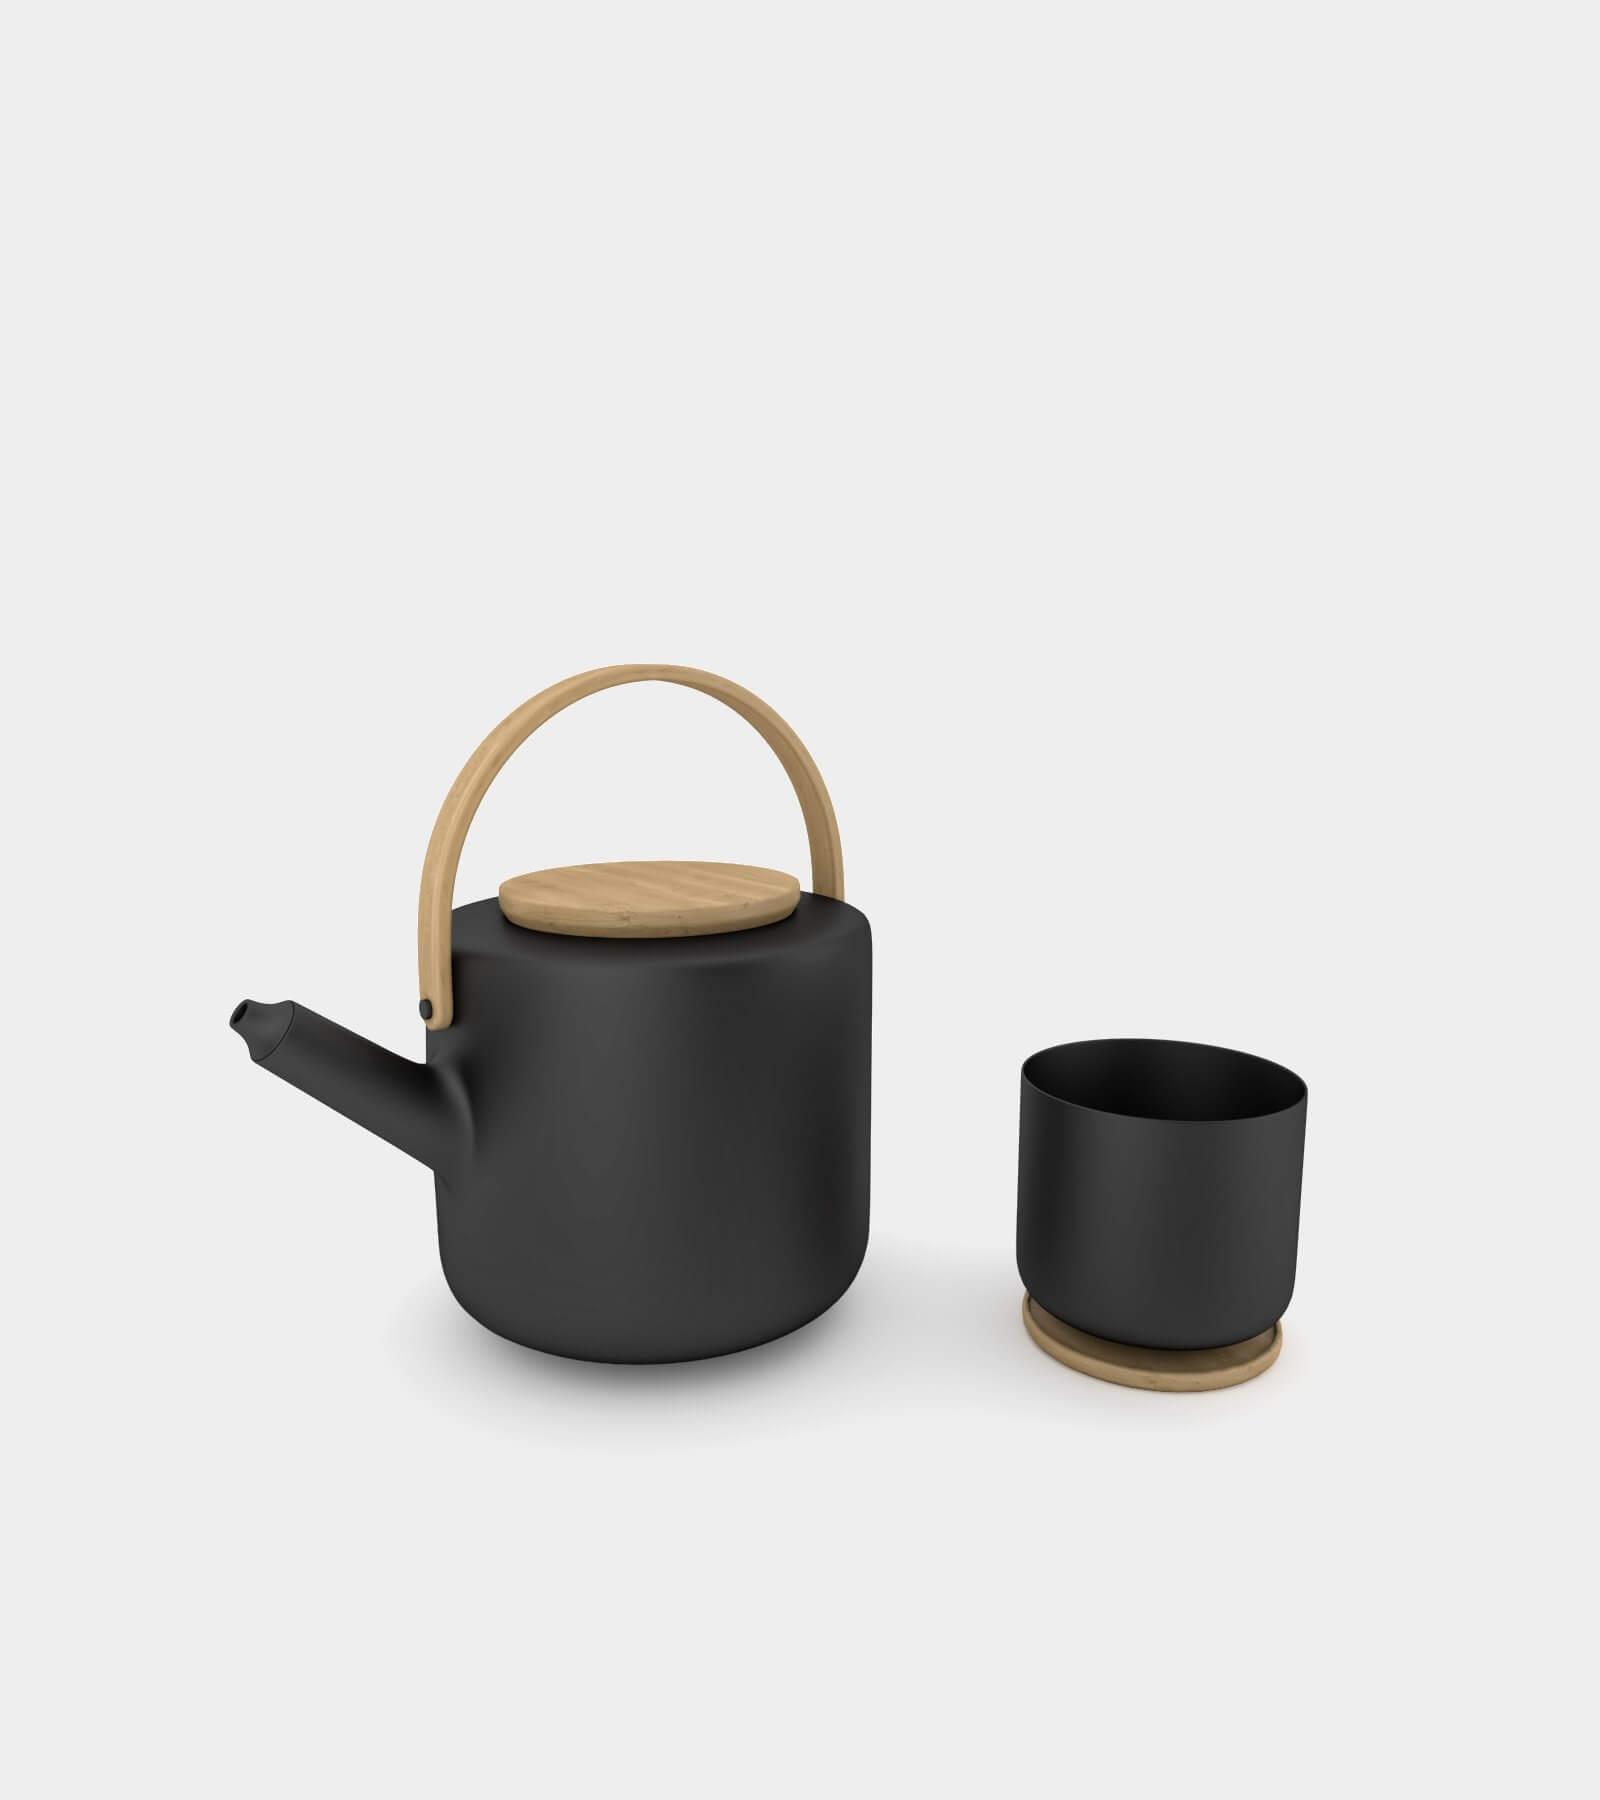 Teapot & tea mug 2- 3D Model